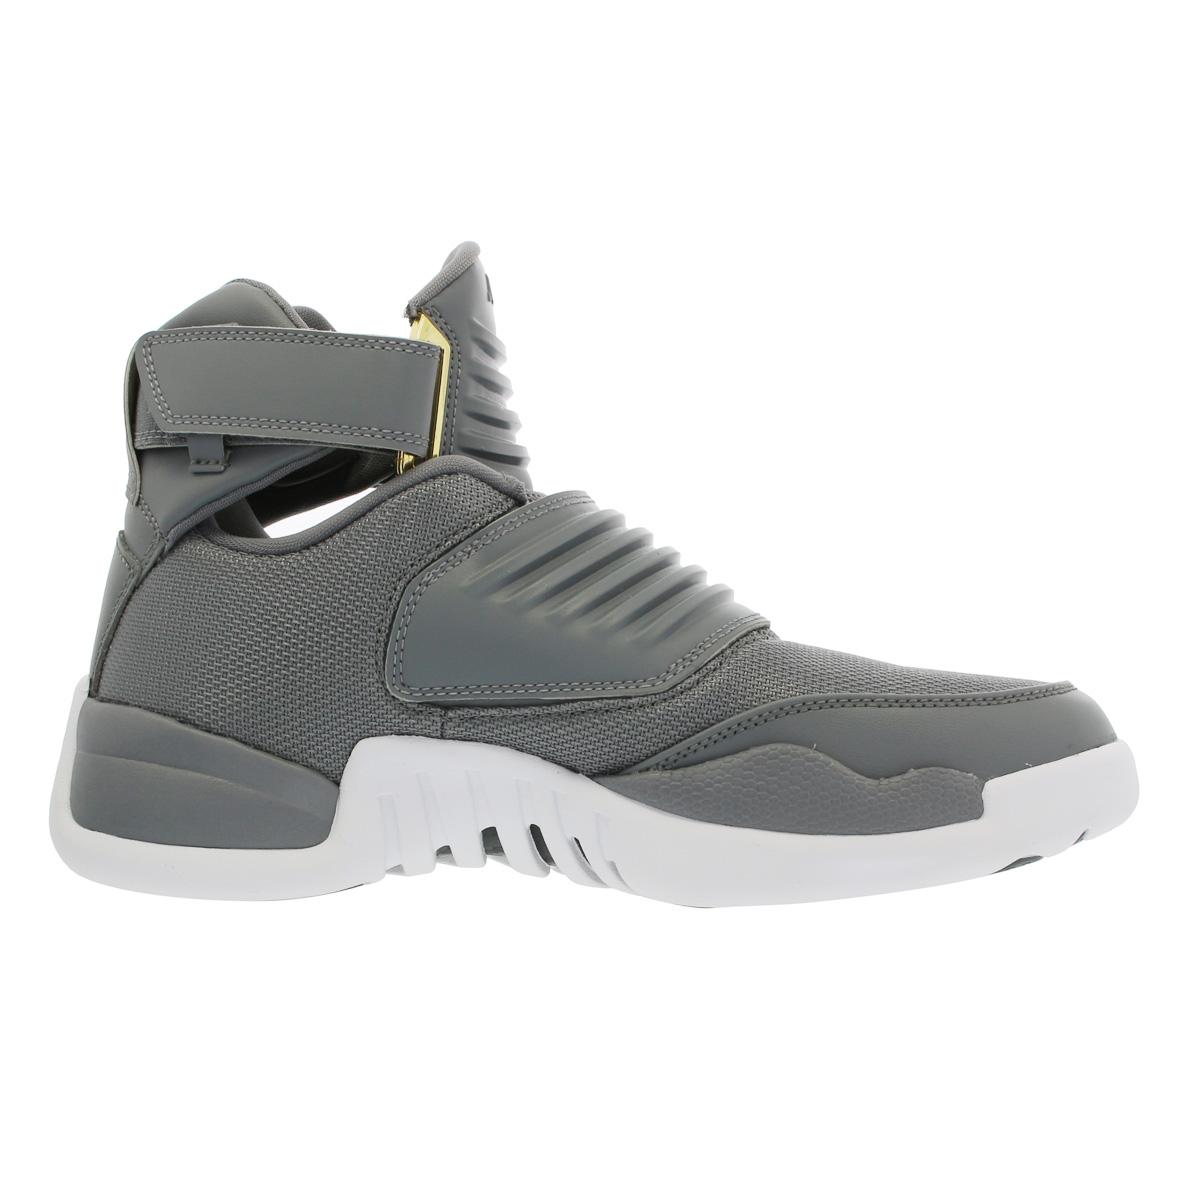 jordan generation 23 men shoes nz